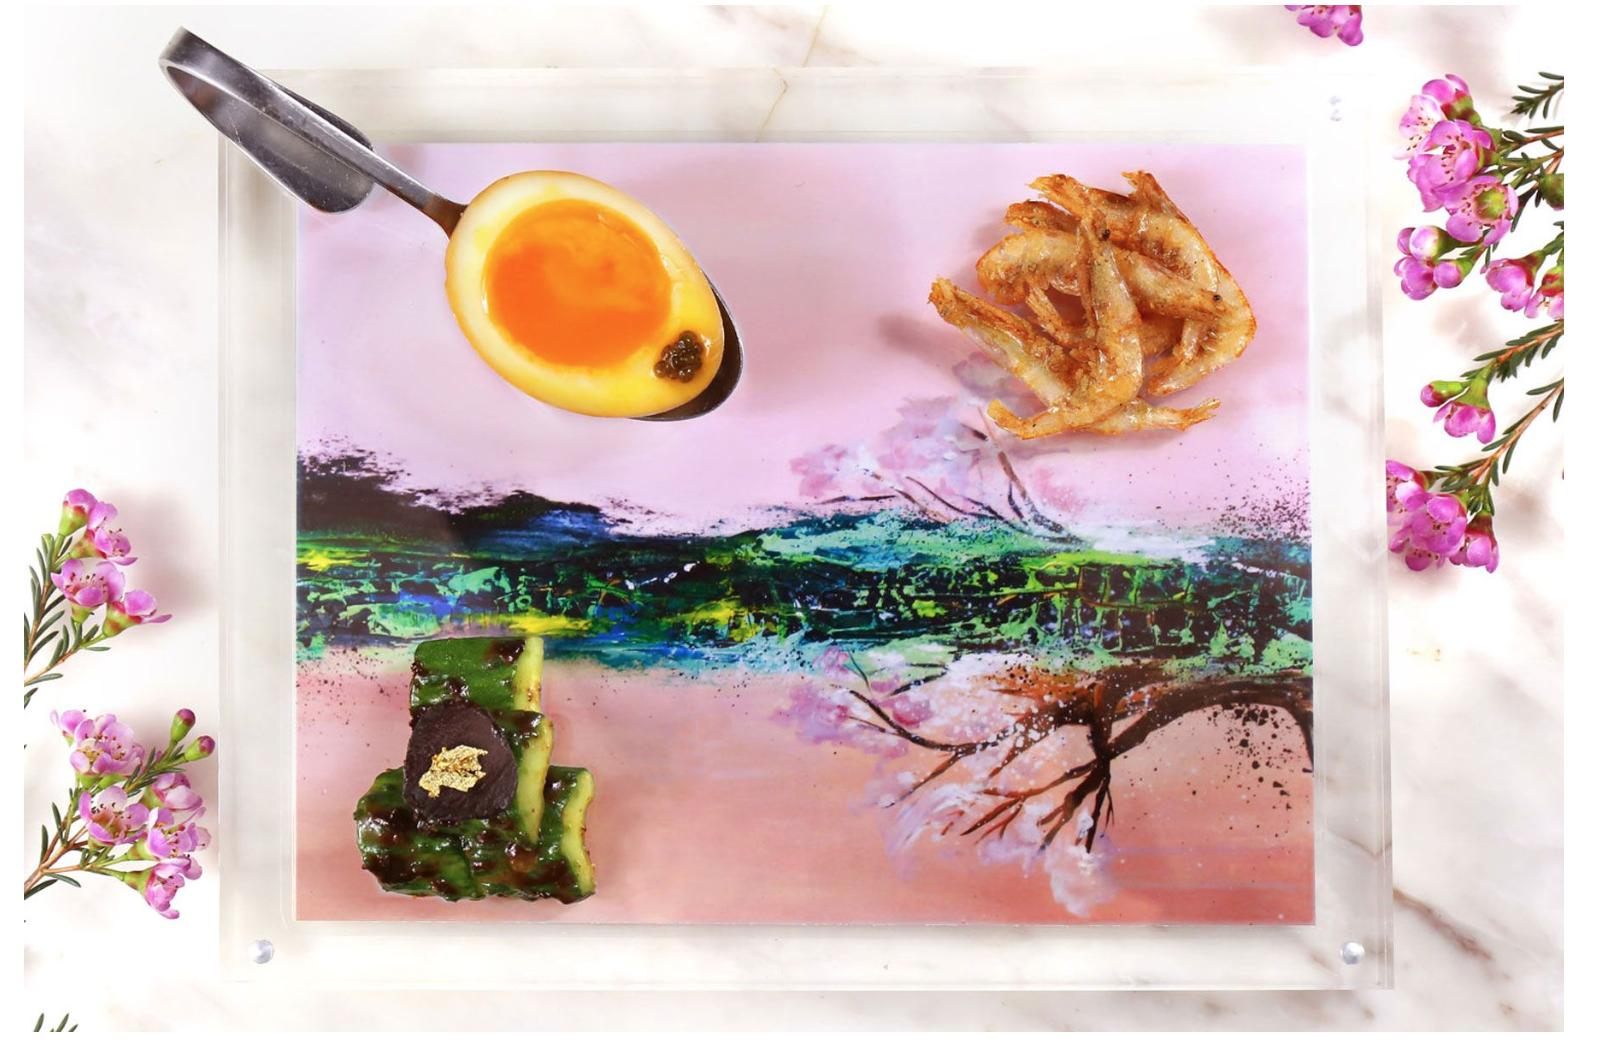 Tycoon Tan X Liane Chu : Presenting an Art Inspired Dining Experienc e